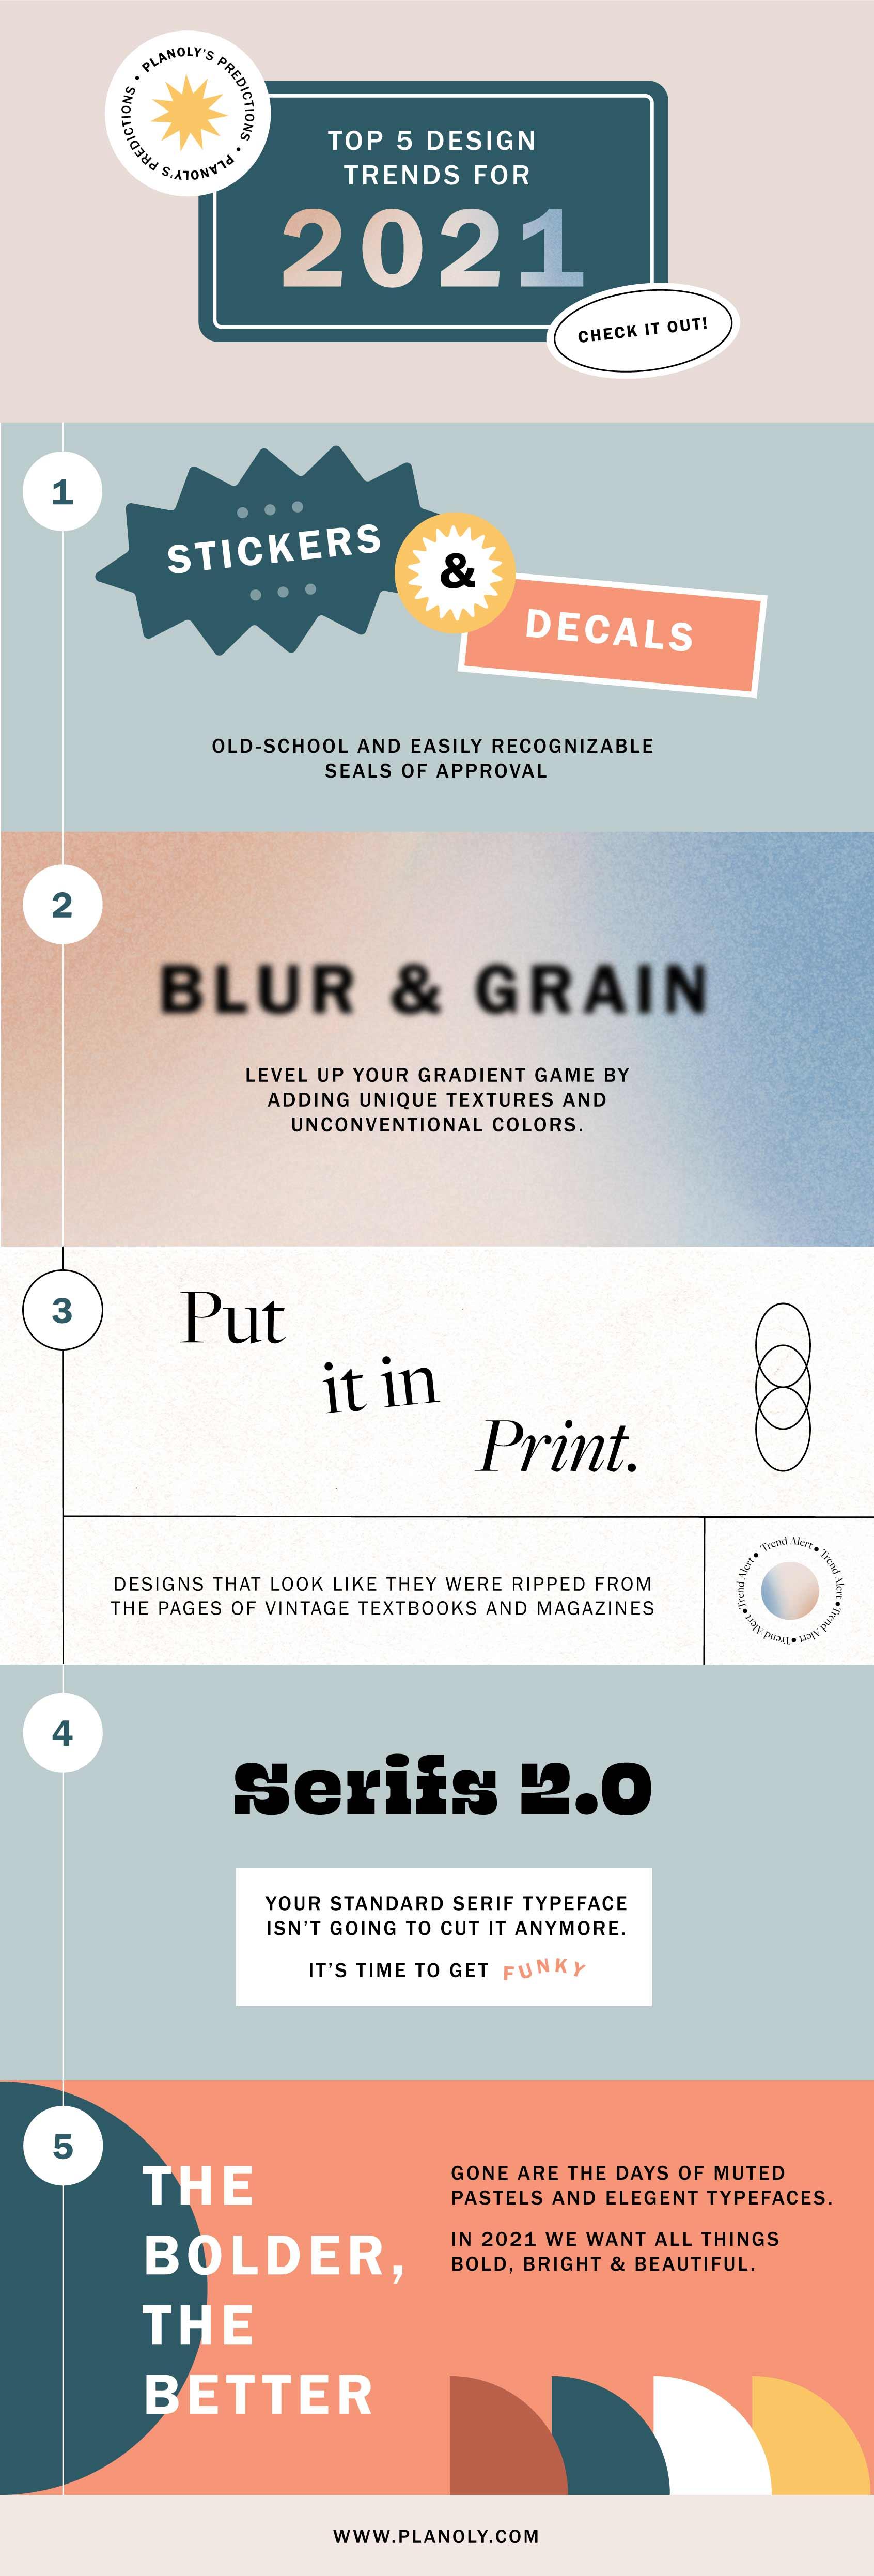 PLANOLY-Blog-Post--2021-Design-Trends-Img6